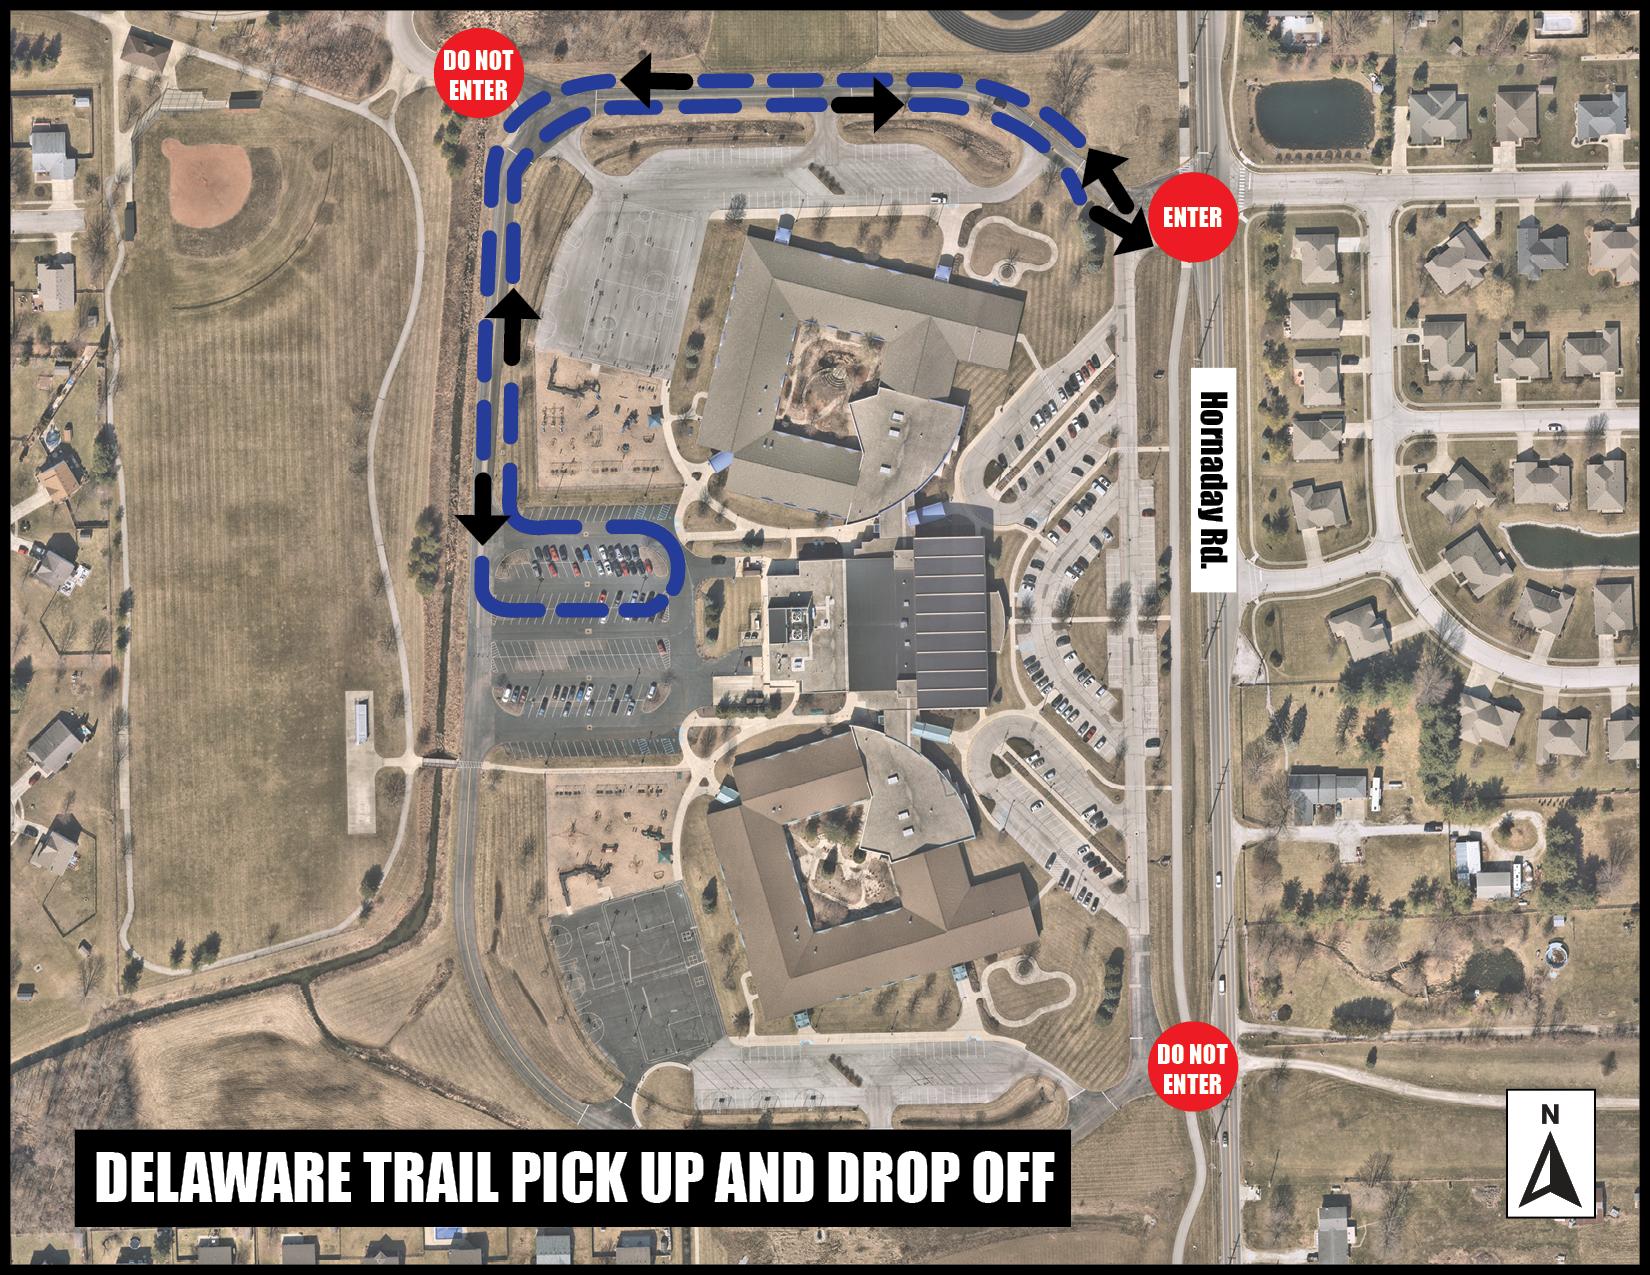 DT Pickup Drop off map